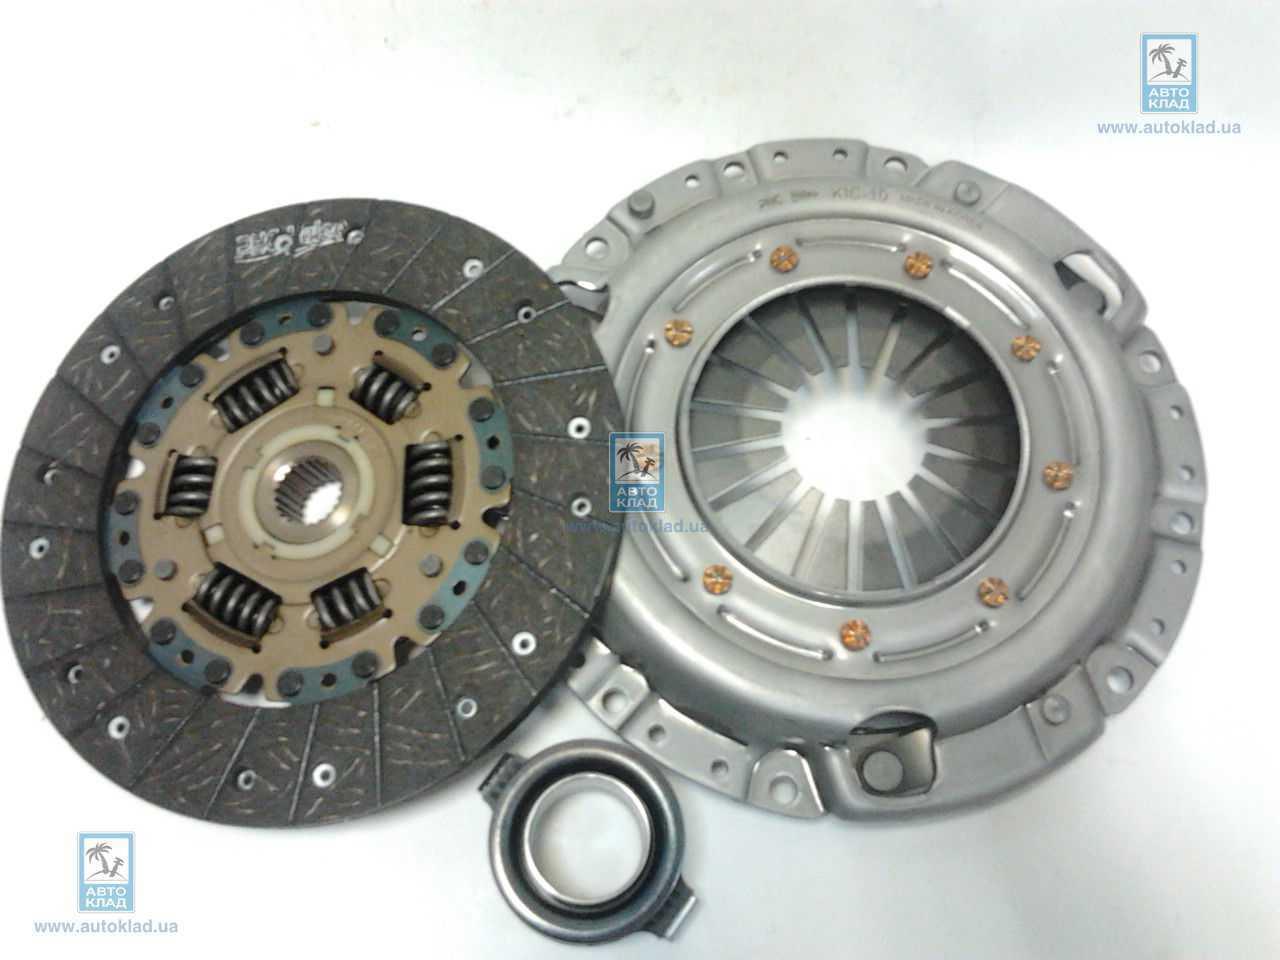 Комплект сцепления VALEO PHC KIK-004